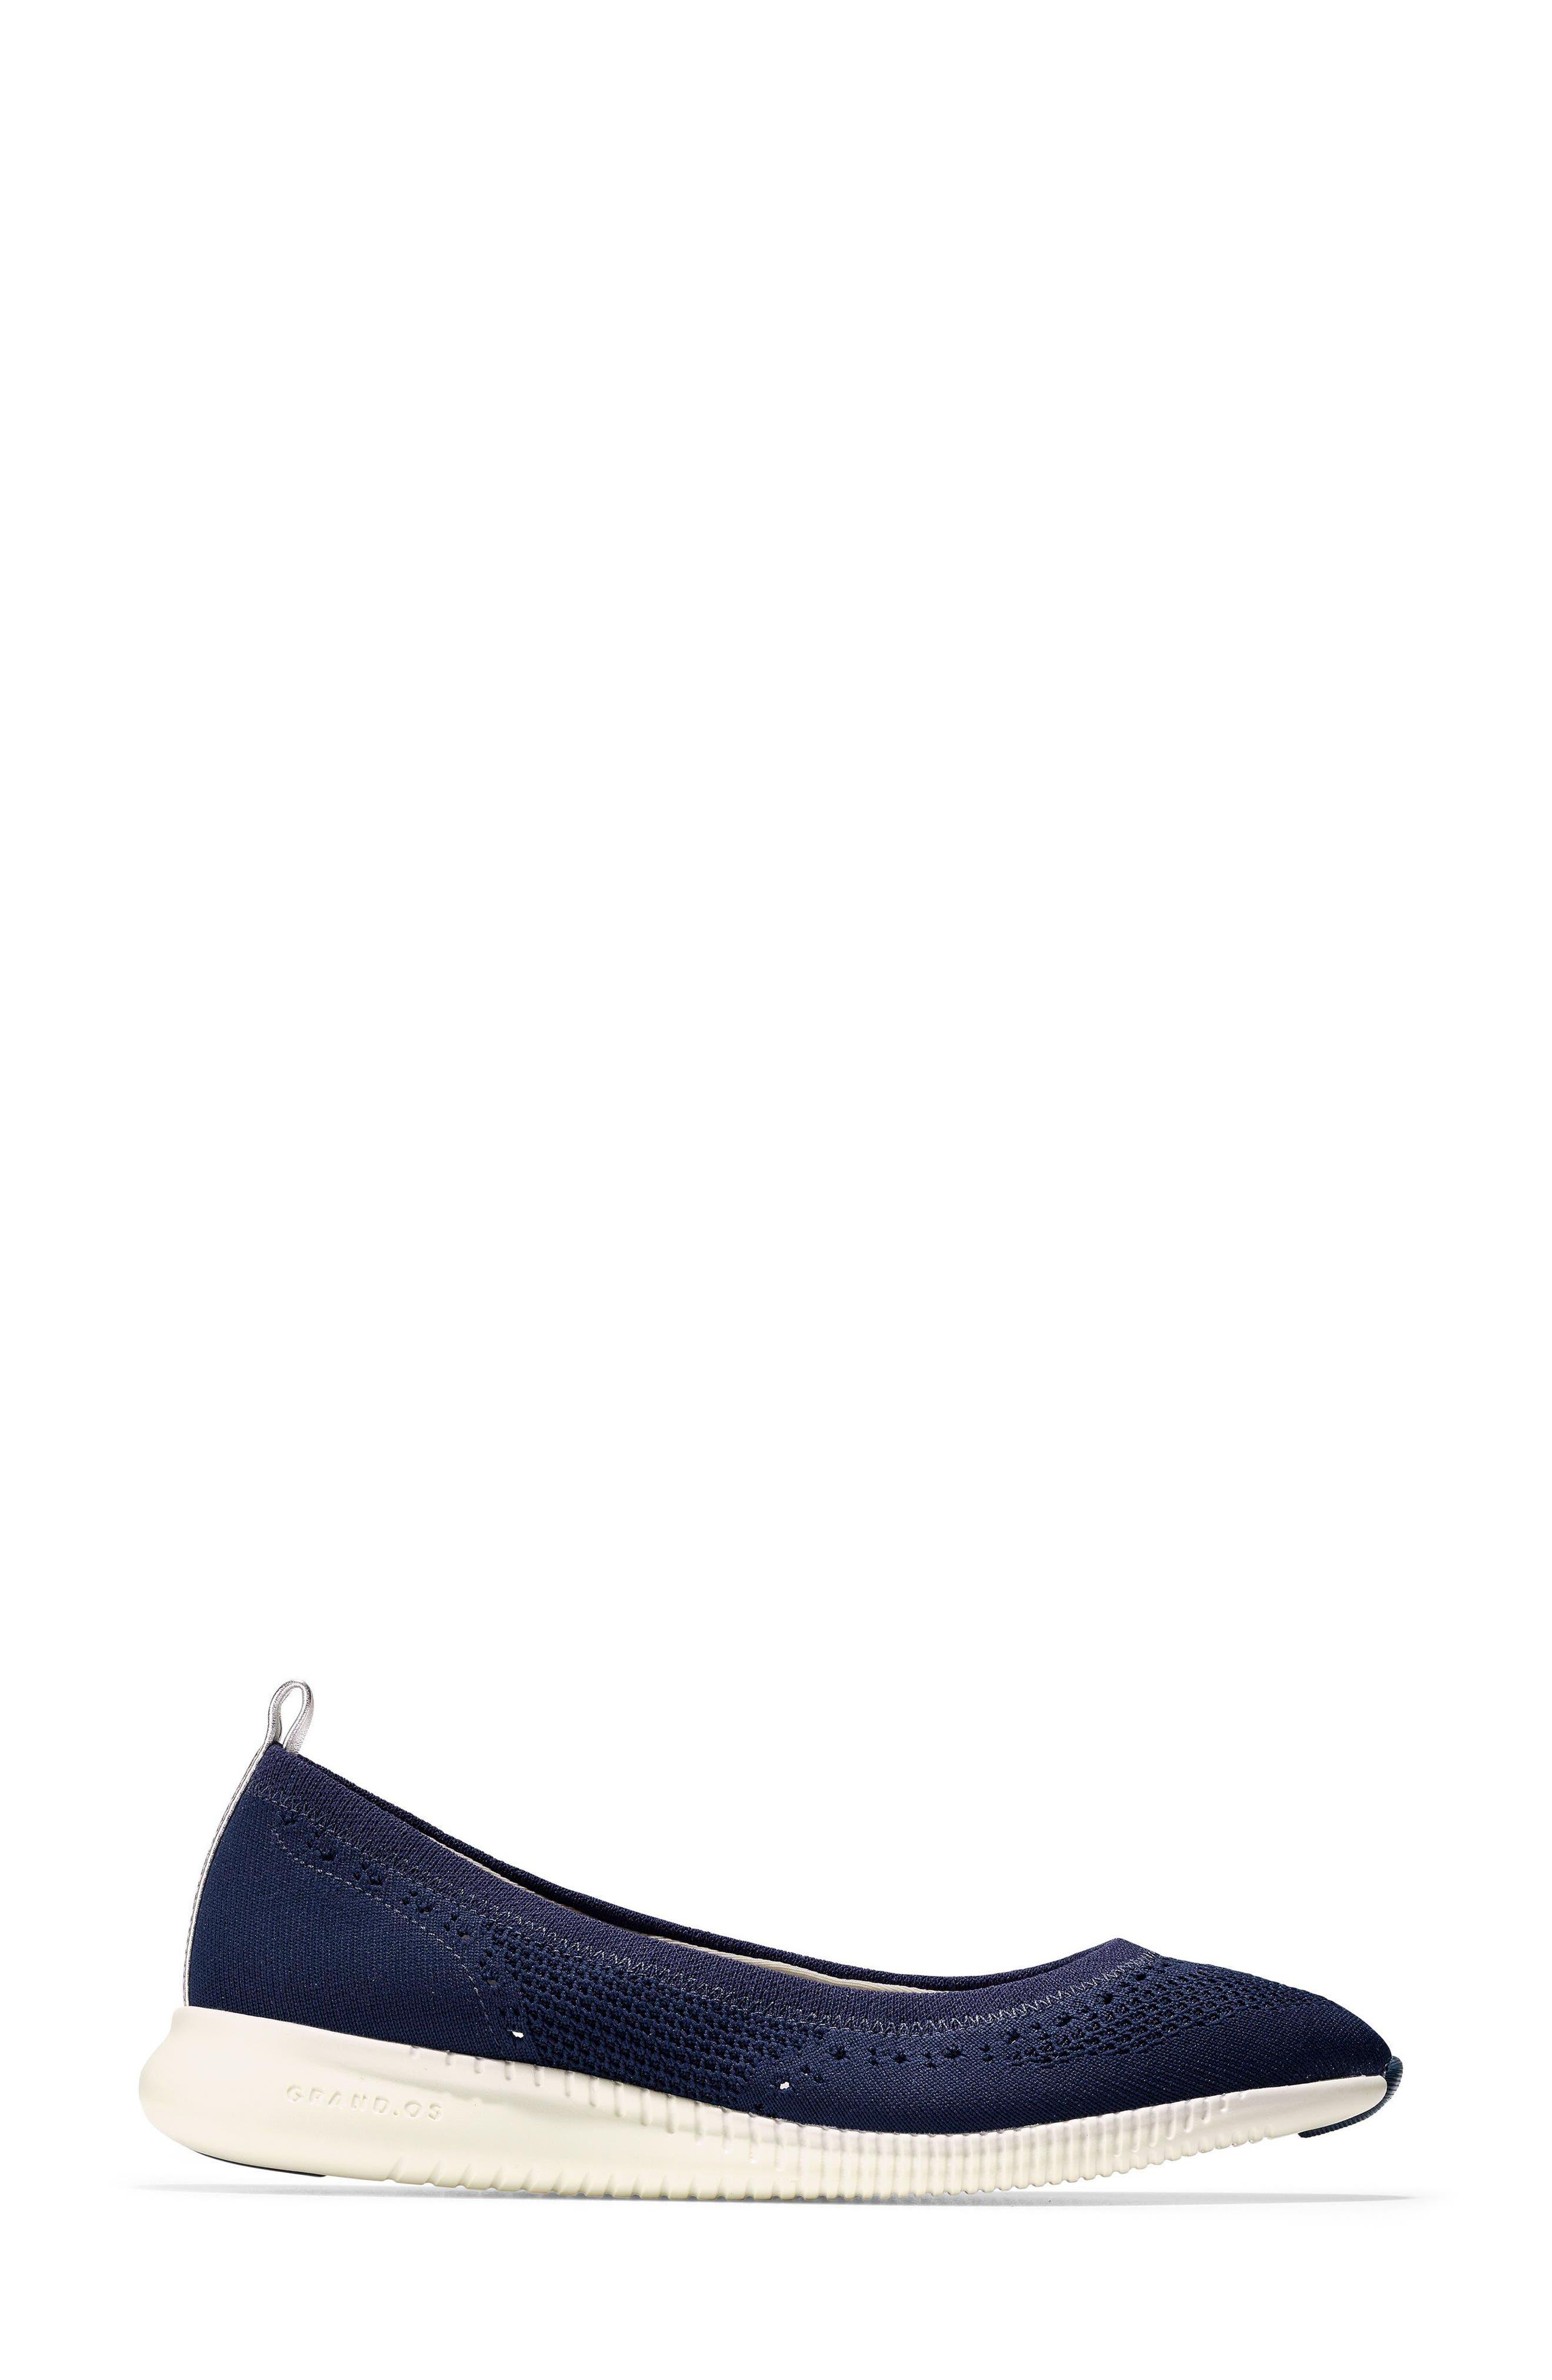 2.ZERØGRAND Stitchlite Ballet Flat,                             Alternate thumbnail 3, color,                             MARINE BLUE KNIT